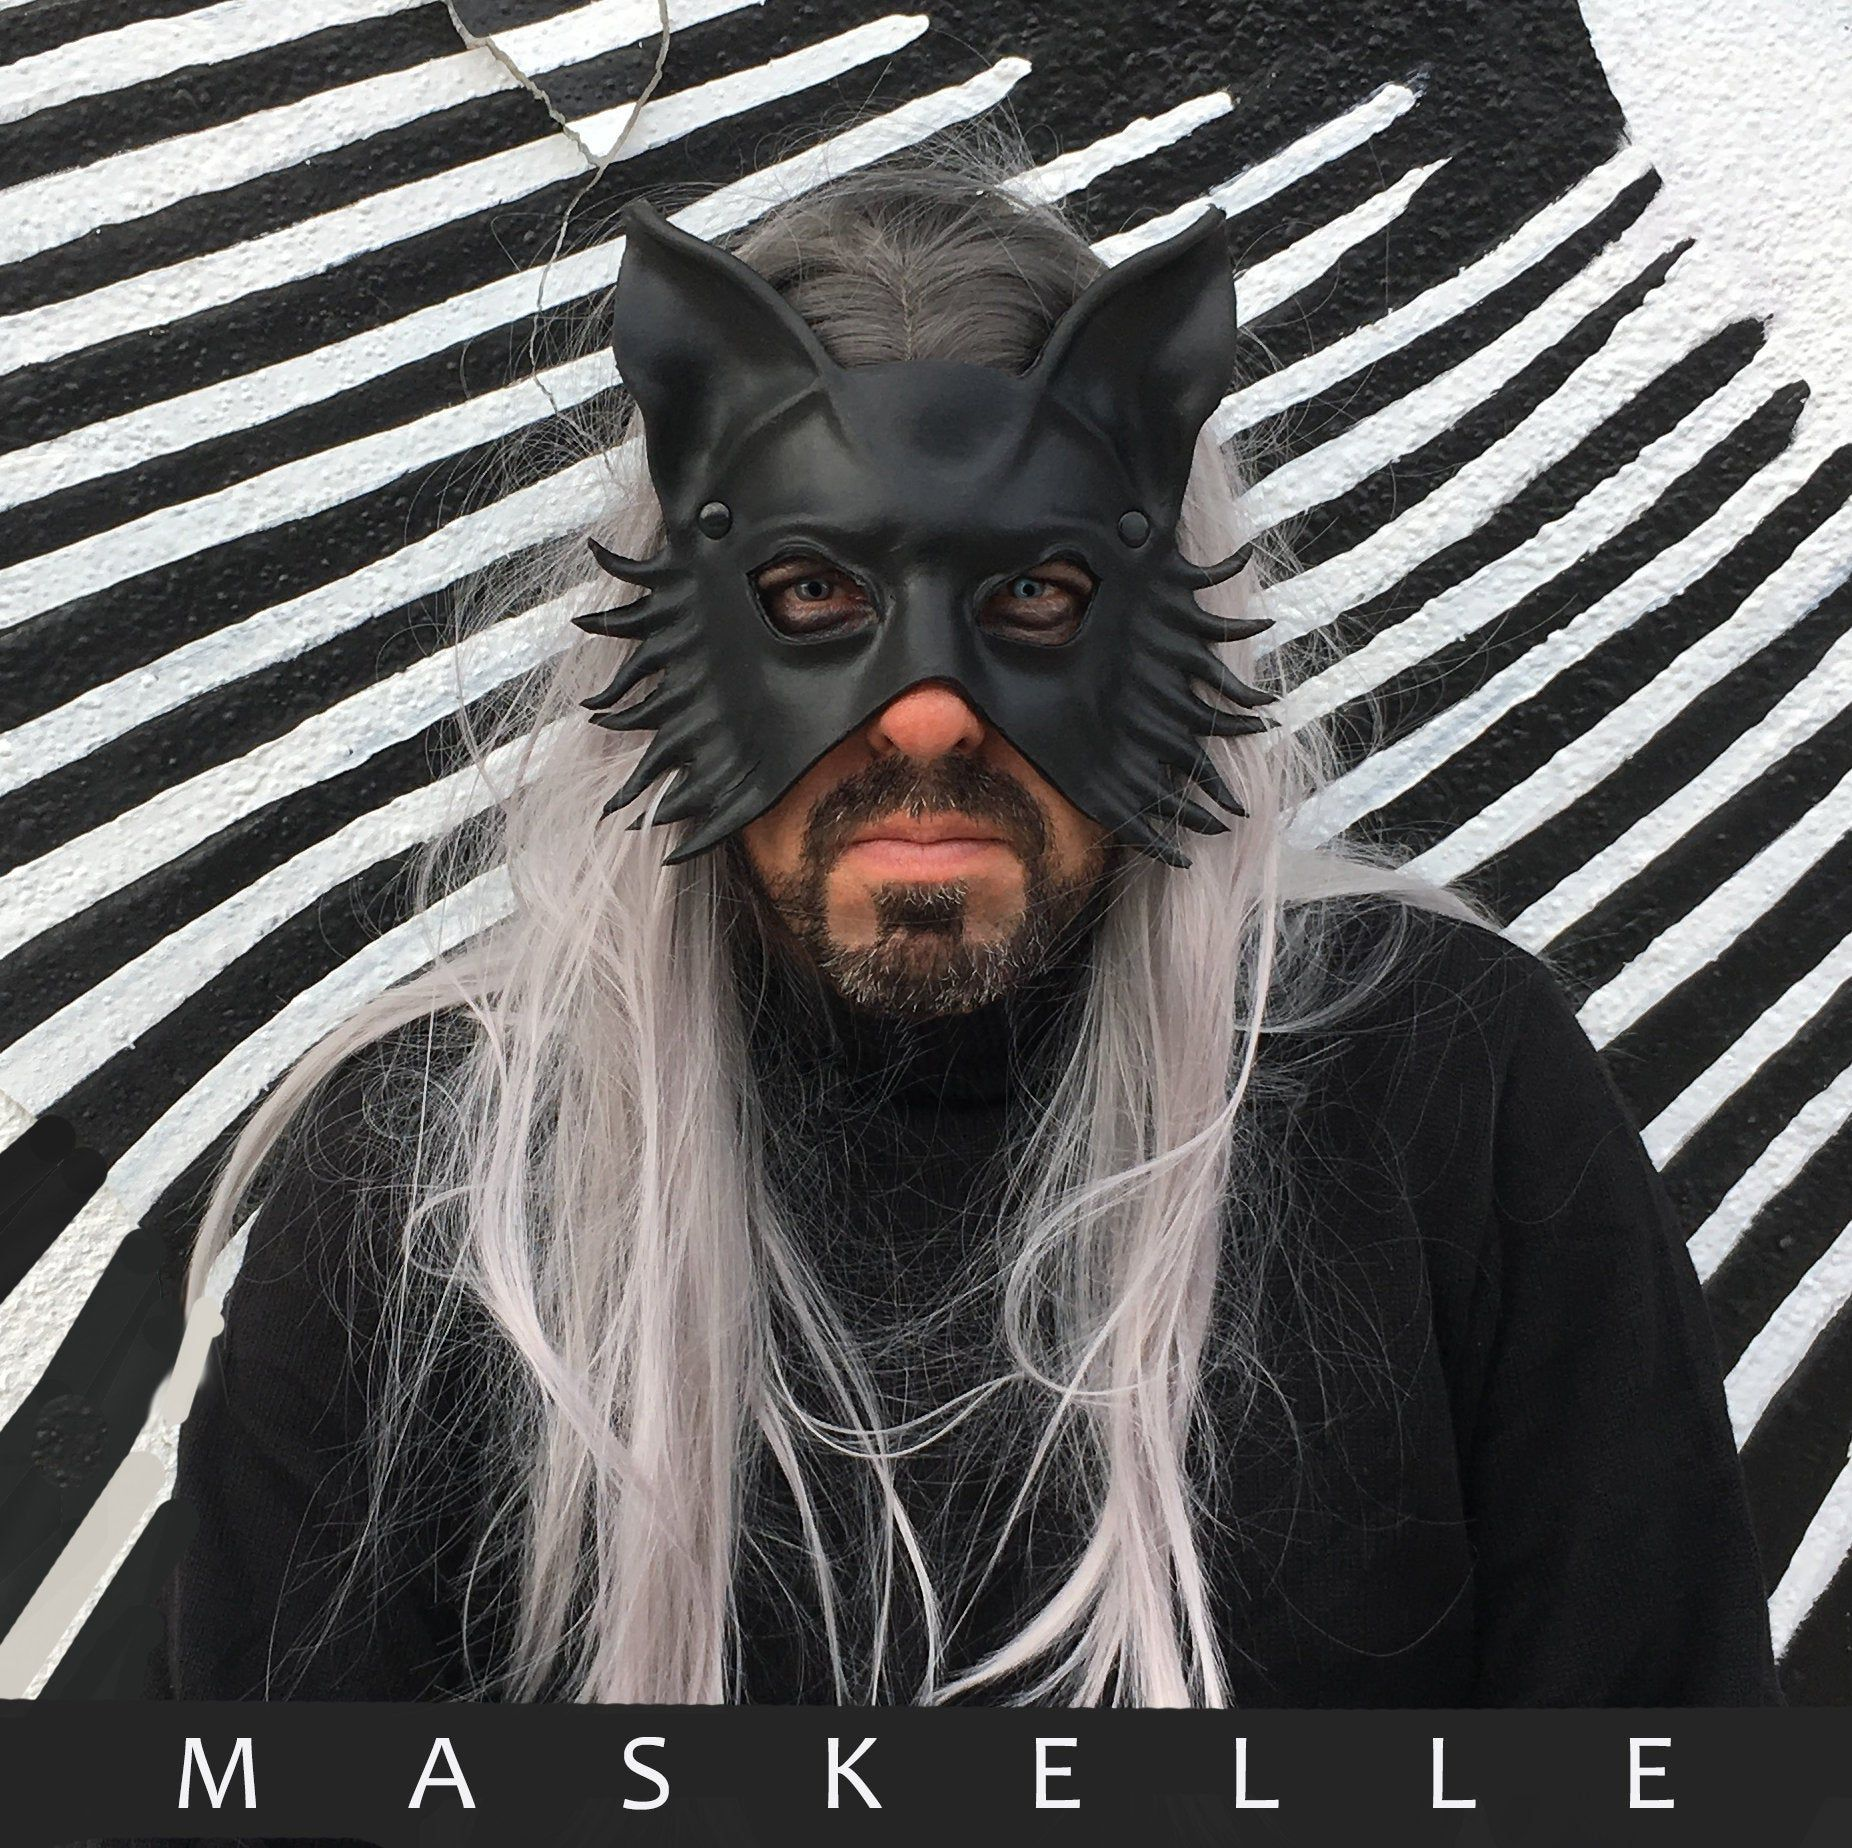 Black Goat Mask by Maskelle Masks flexible comfy Halloween costume adult scary